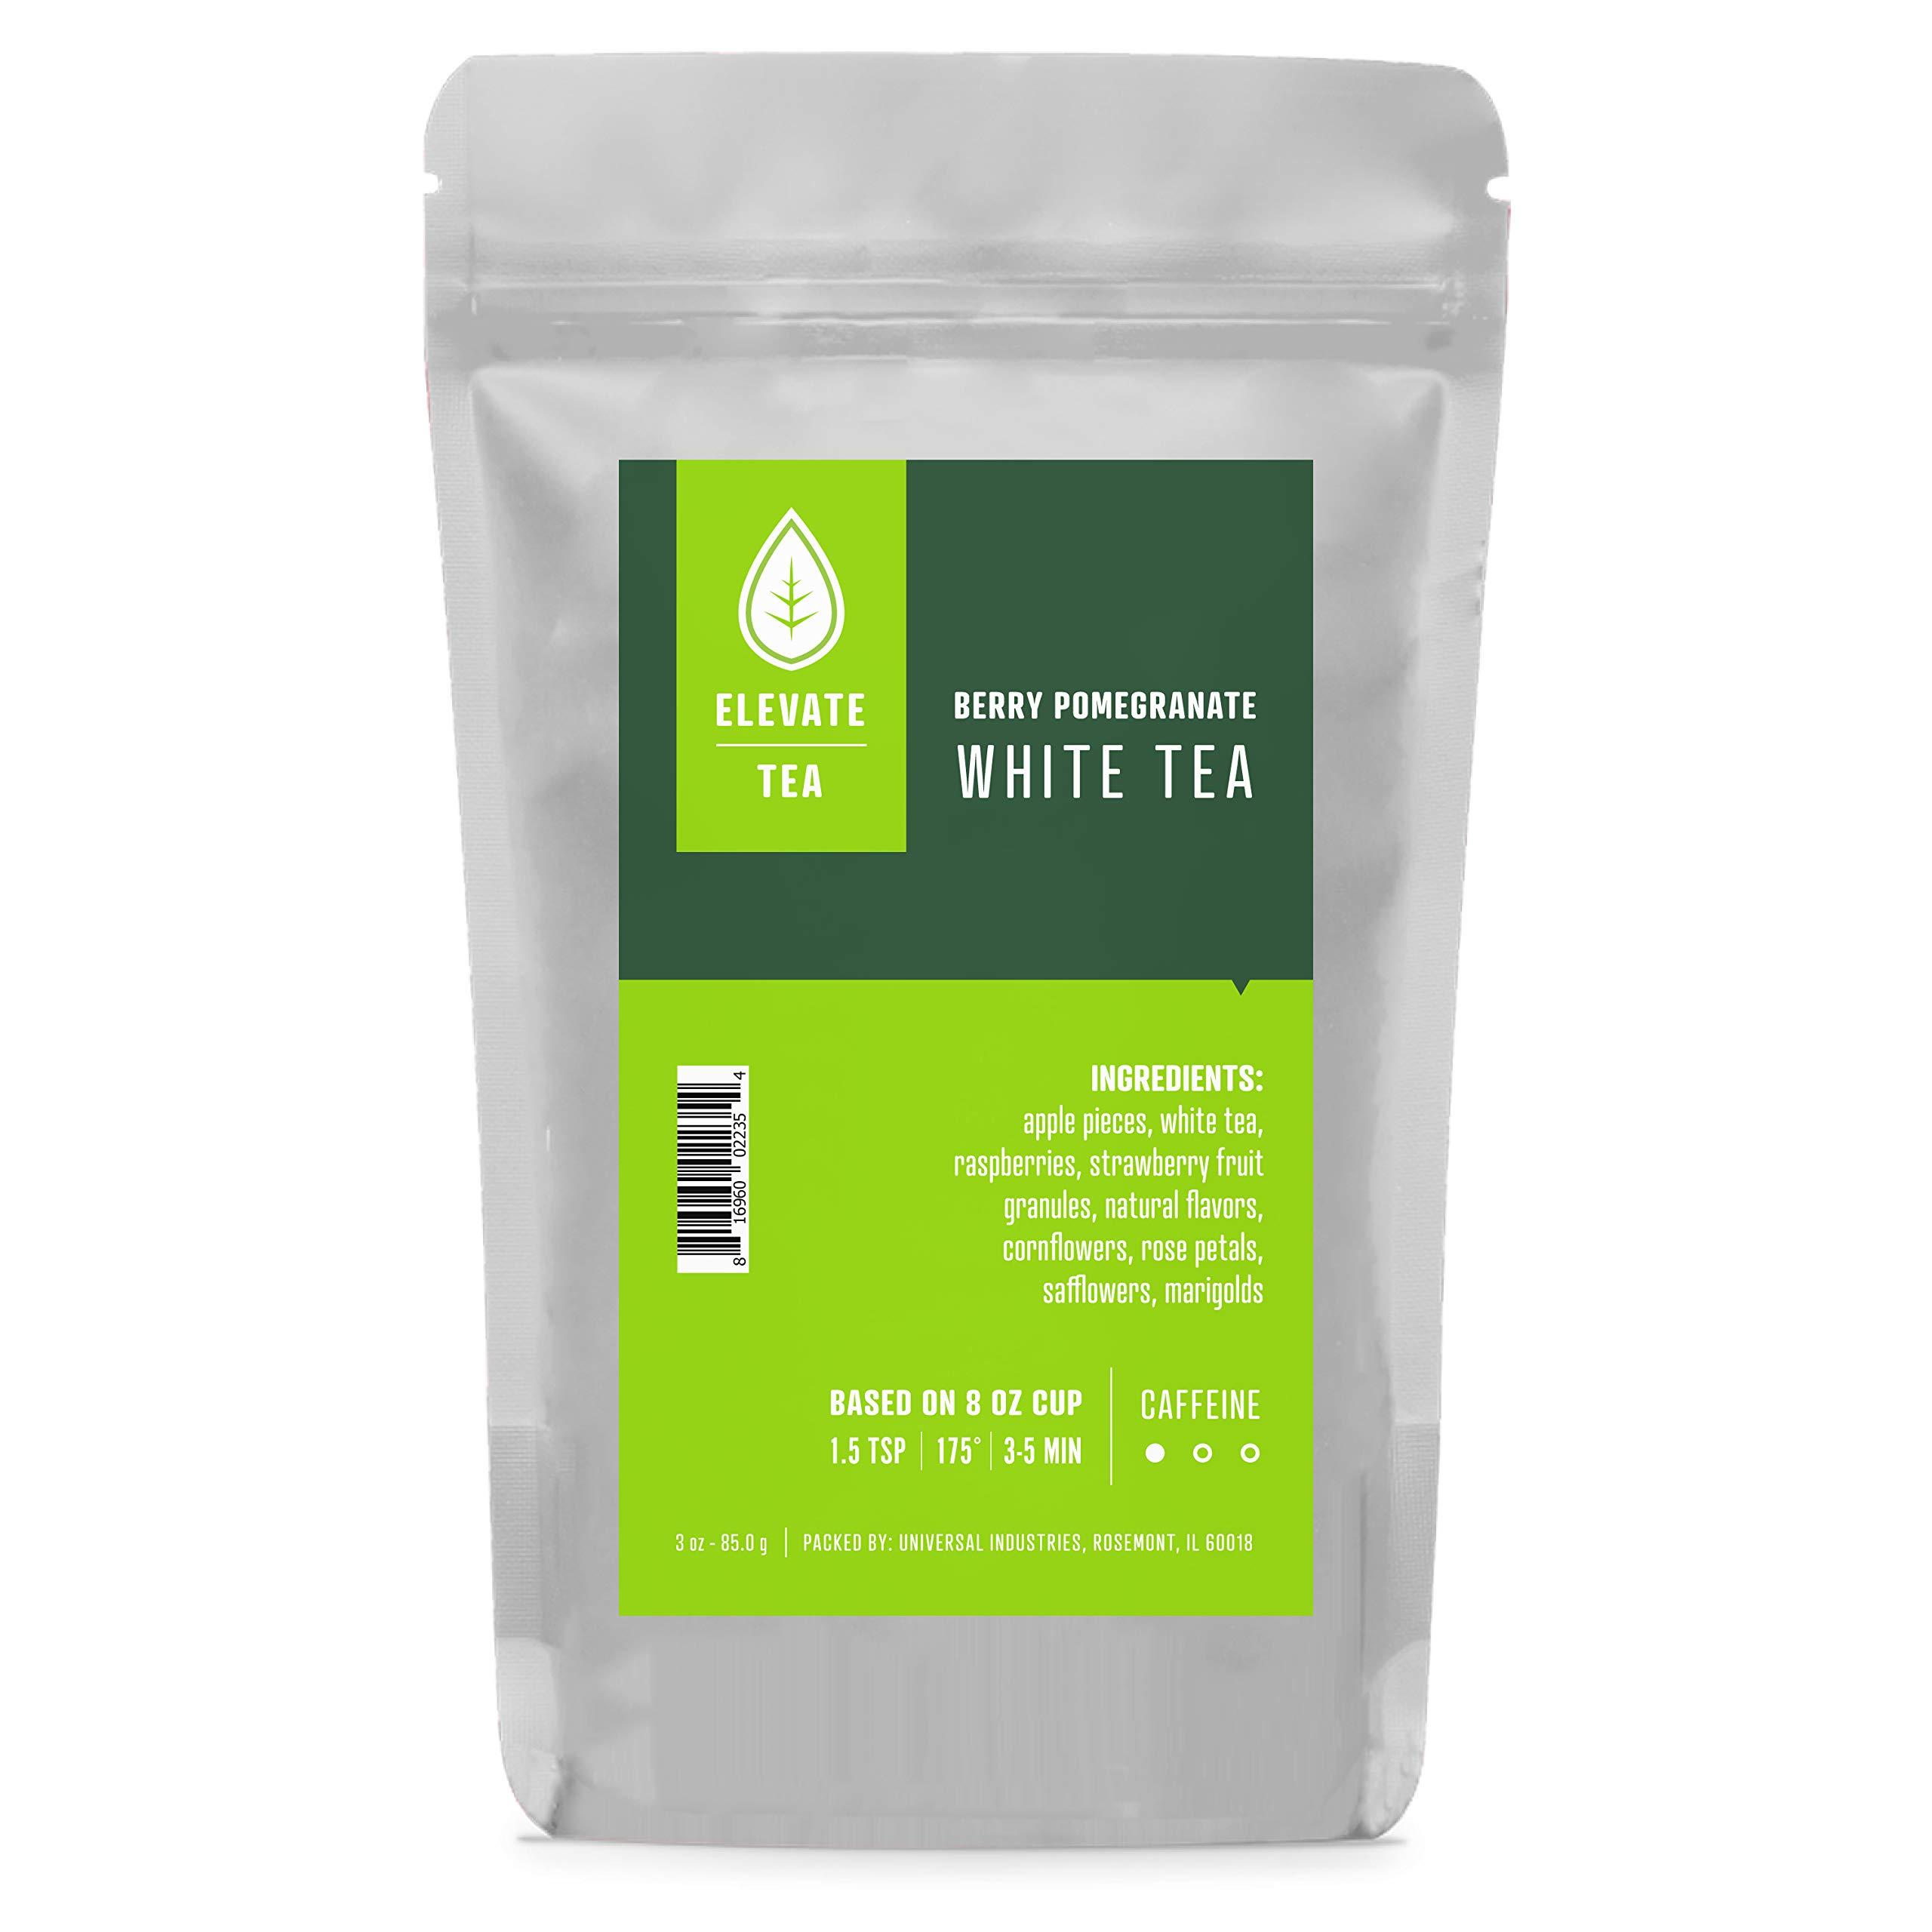 Elevate Tea BERRY POMEGRANATE WHITE TEA, Loose Leaf Tea Blend, 30 servings, 3 Ounce Pouch, Caffeine Level: Medium, Single Unit